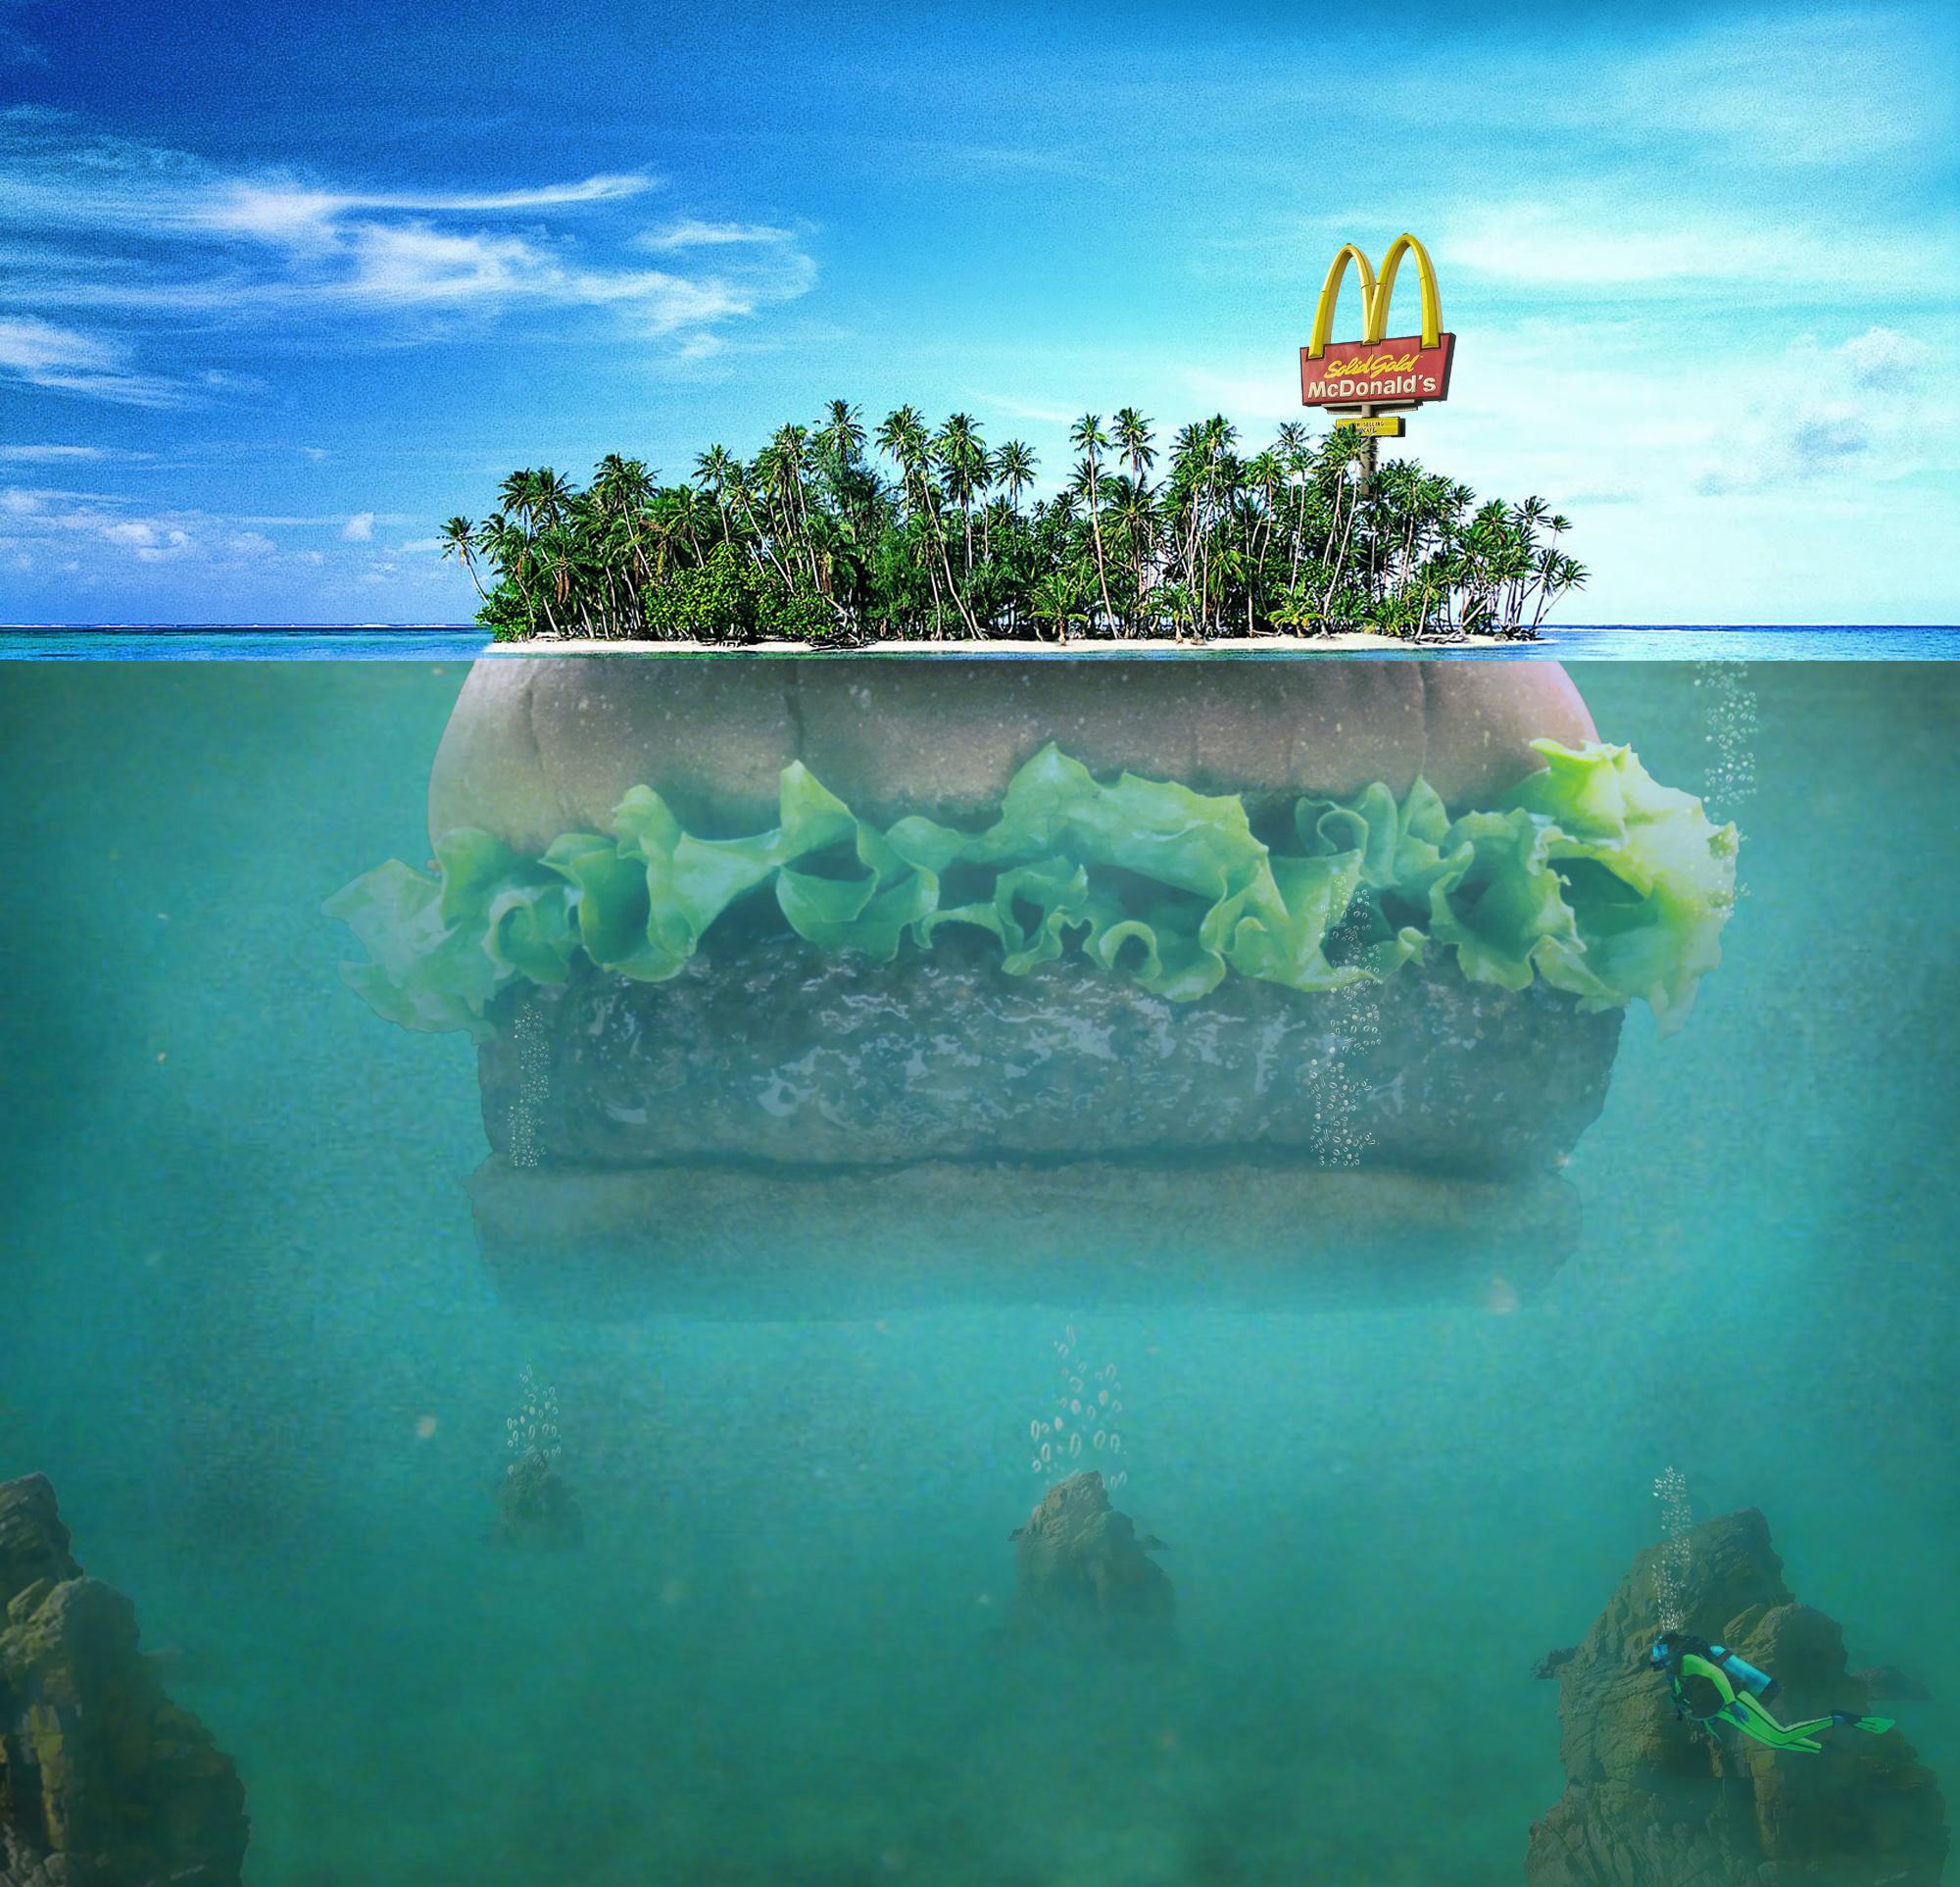 Mcdonalds island